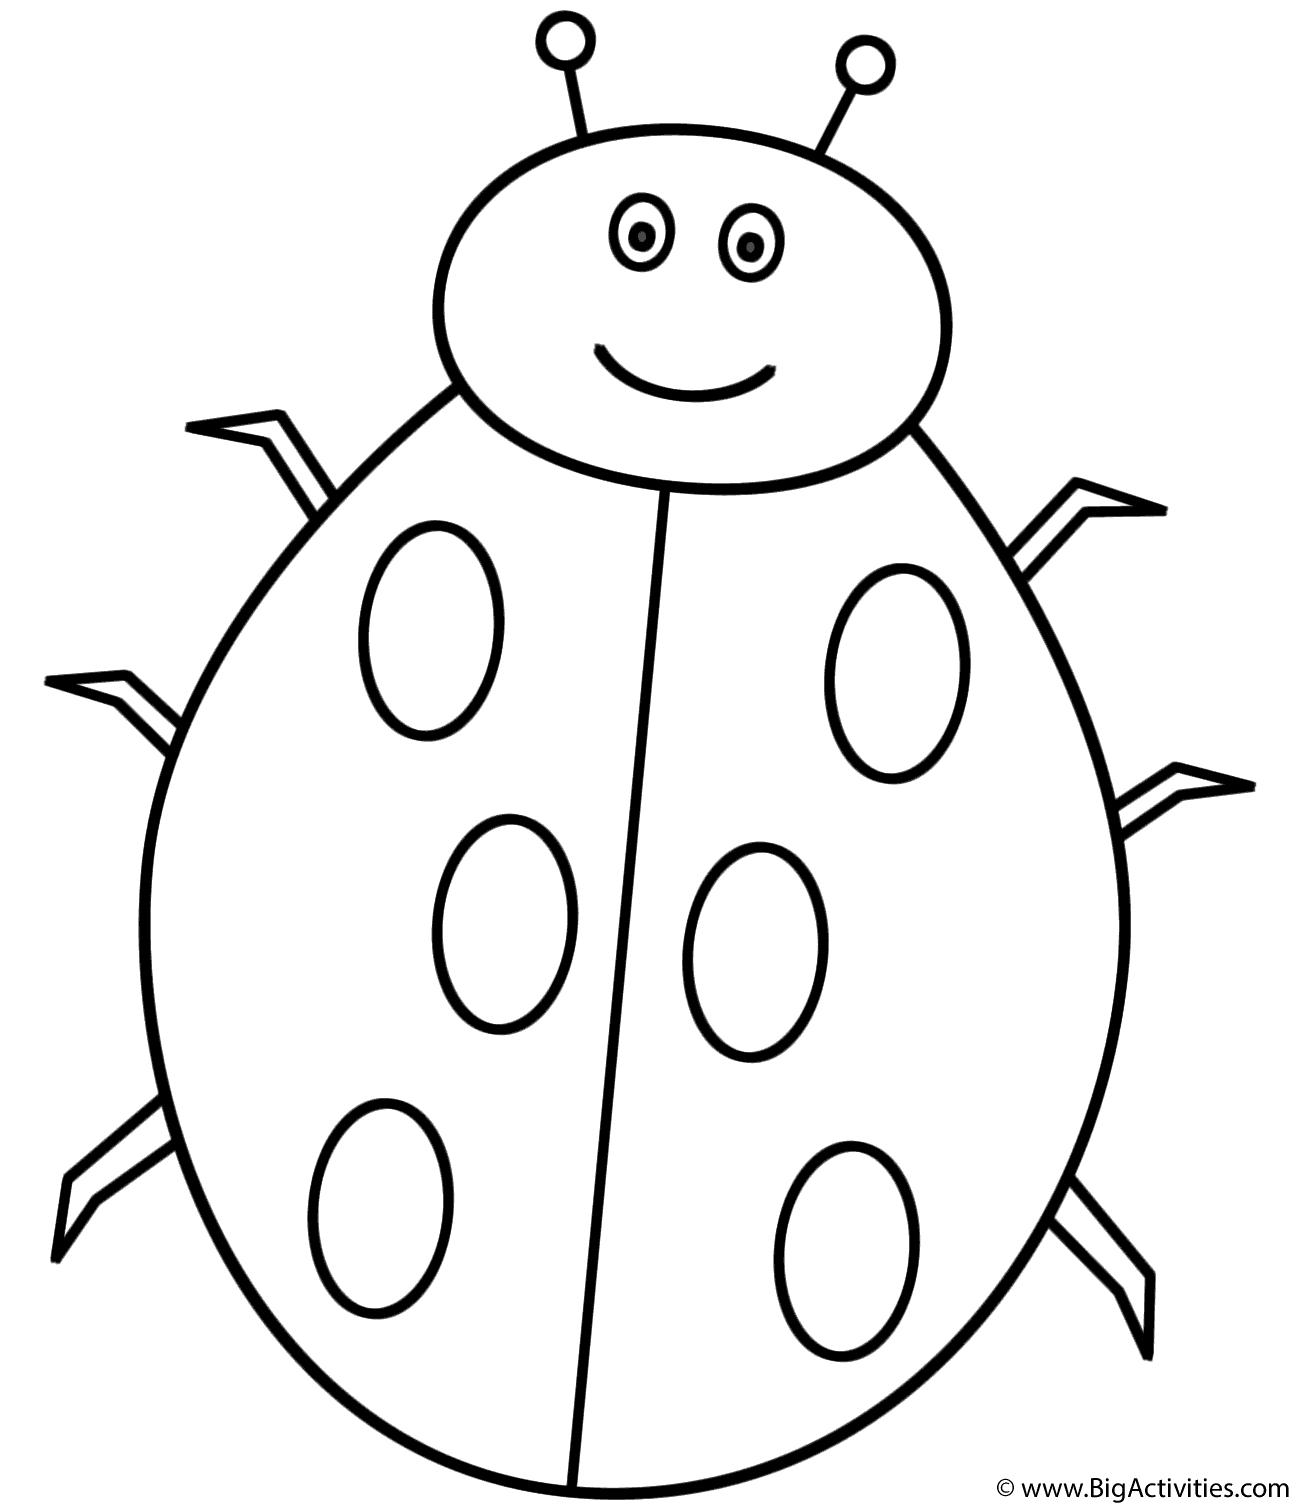 l is for ladybug letter l coloring page alphabet ladybug for l is